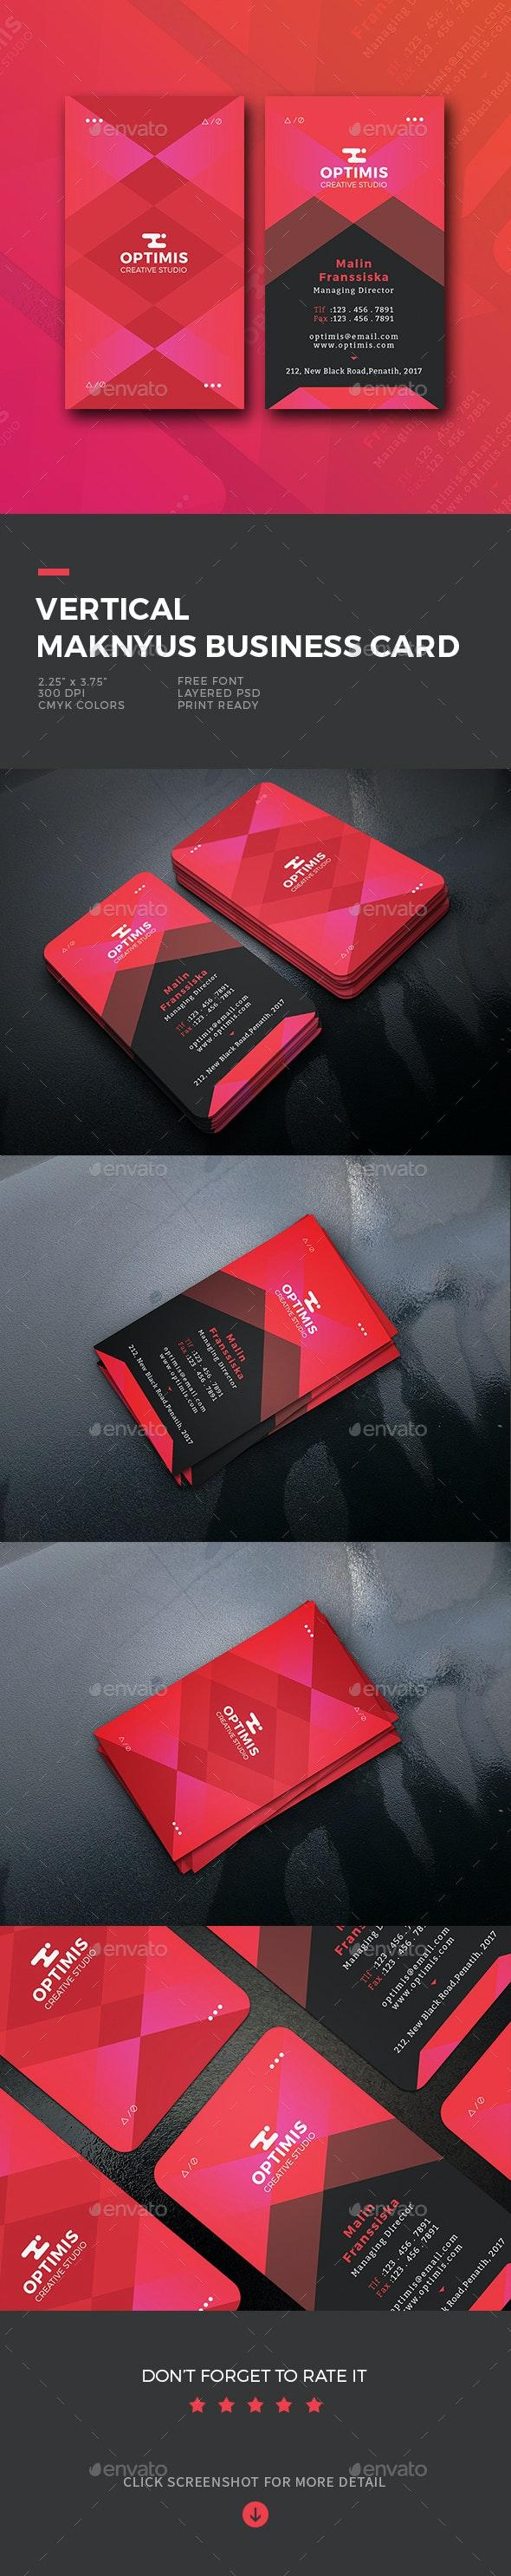 Vertical Maknyus Business Card - Business Cards Print Templates